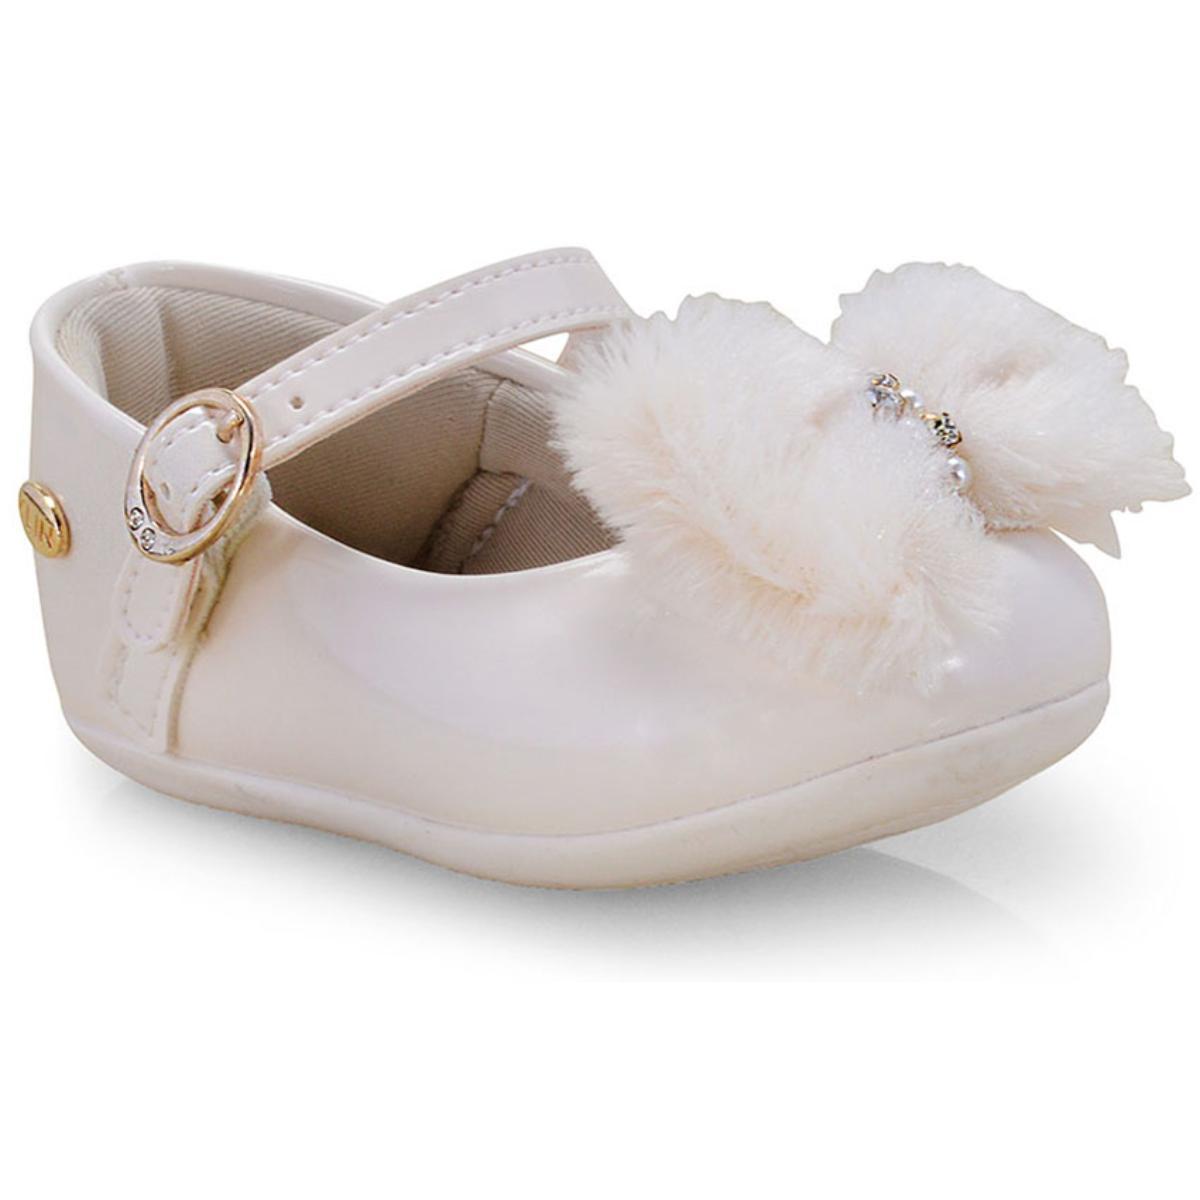 Sapatilha Fem Infantil Klin 125.099 Off White